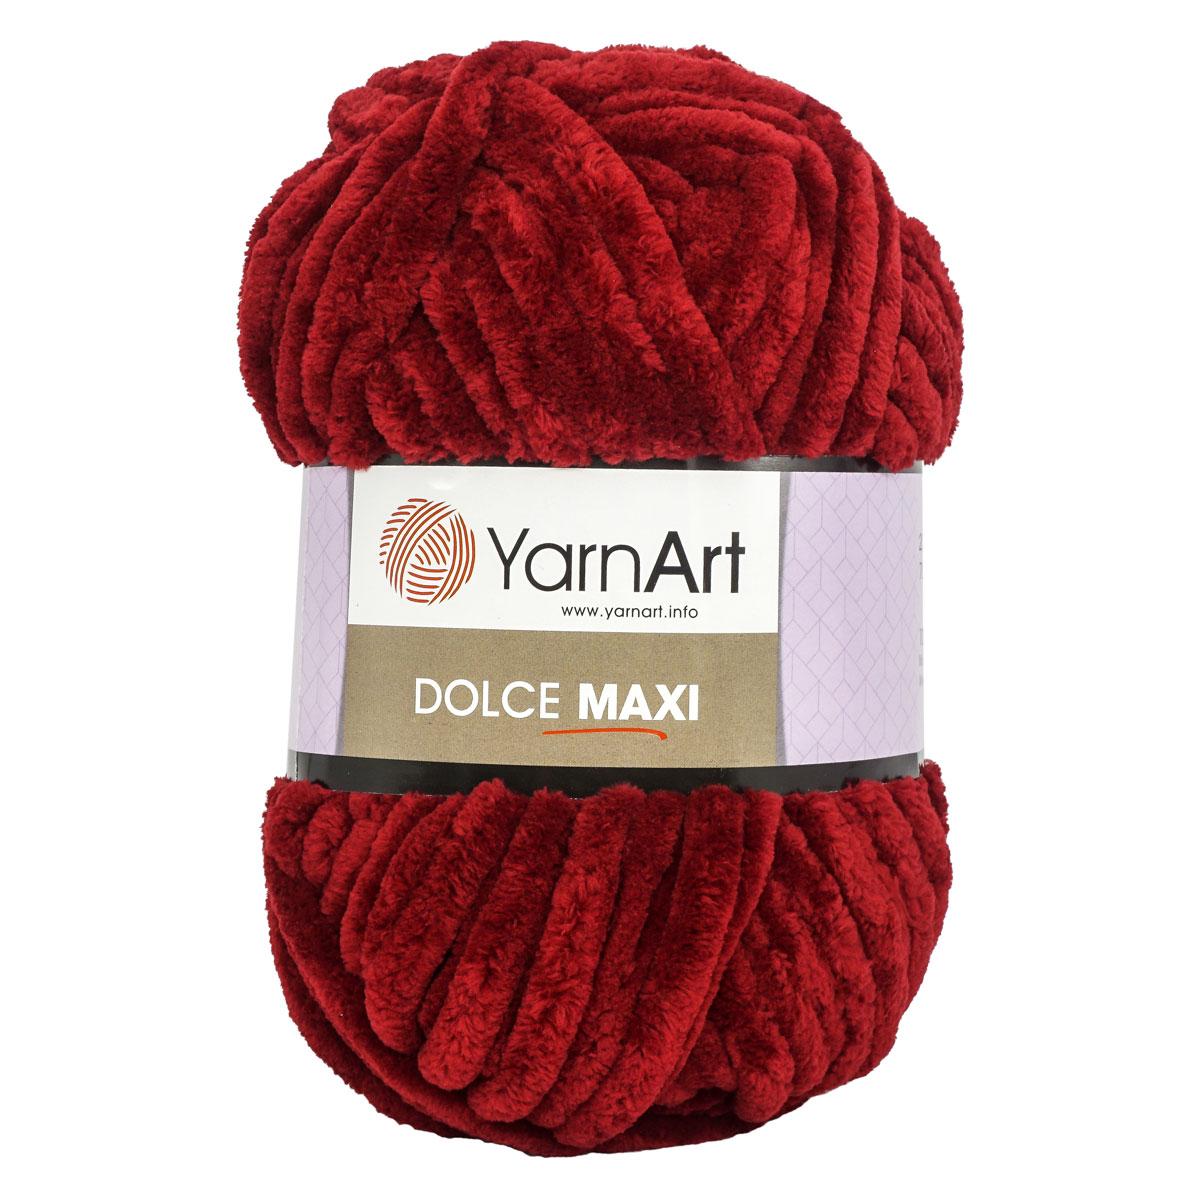 Пряжа YarnArt 'Dolce Maxi' 200г 70м (100% микрополиэстер) (752 бордо) фото